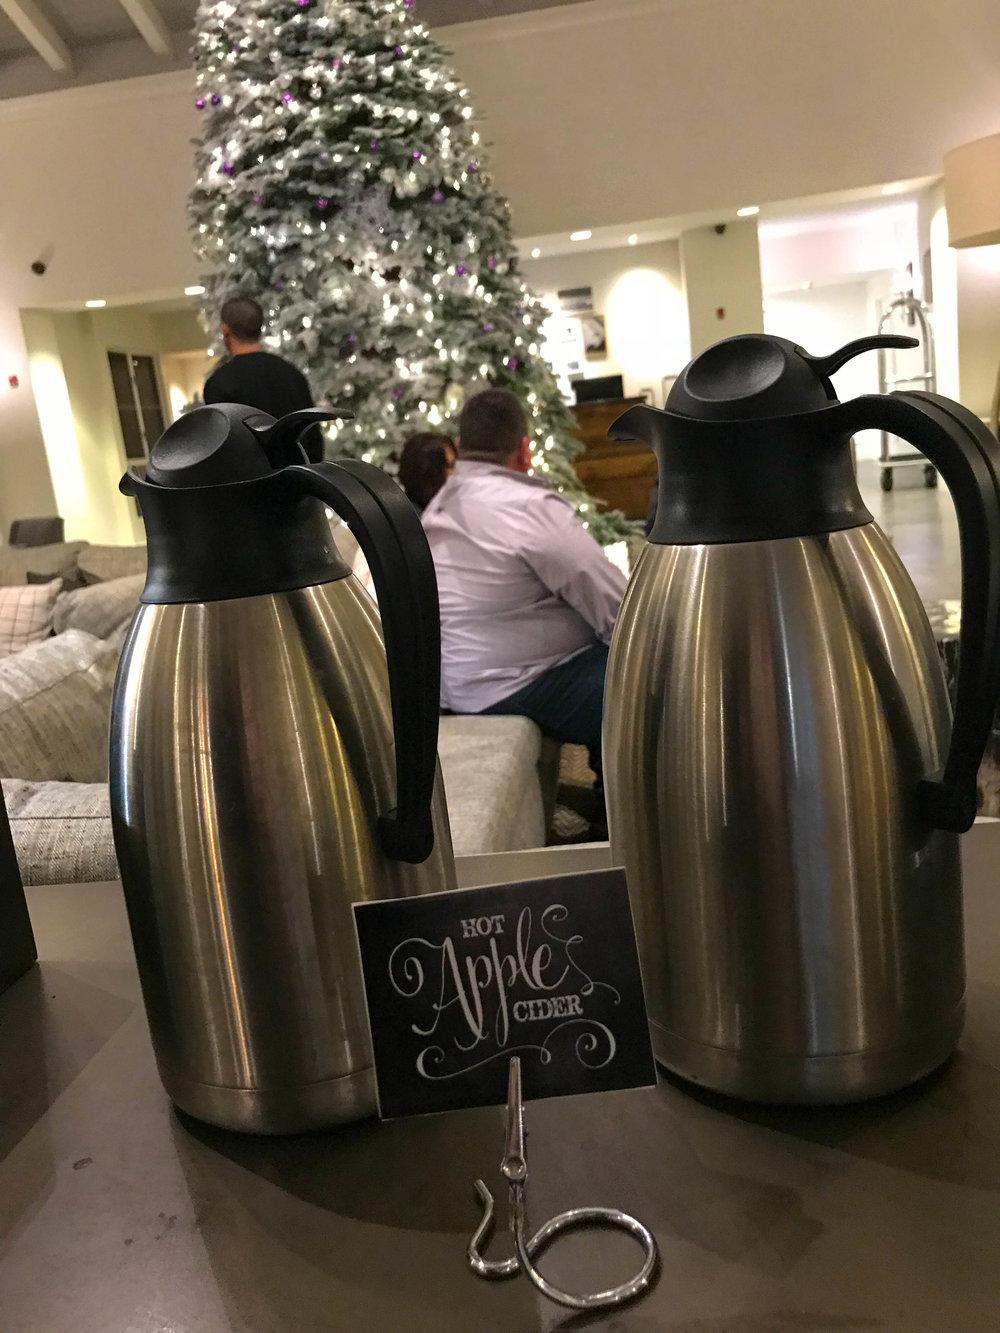 Hyatt Regency Sonoma County Lobby - Cider and cocoa